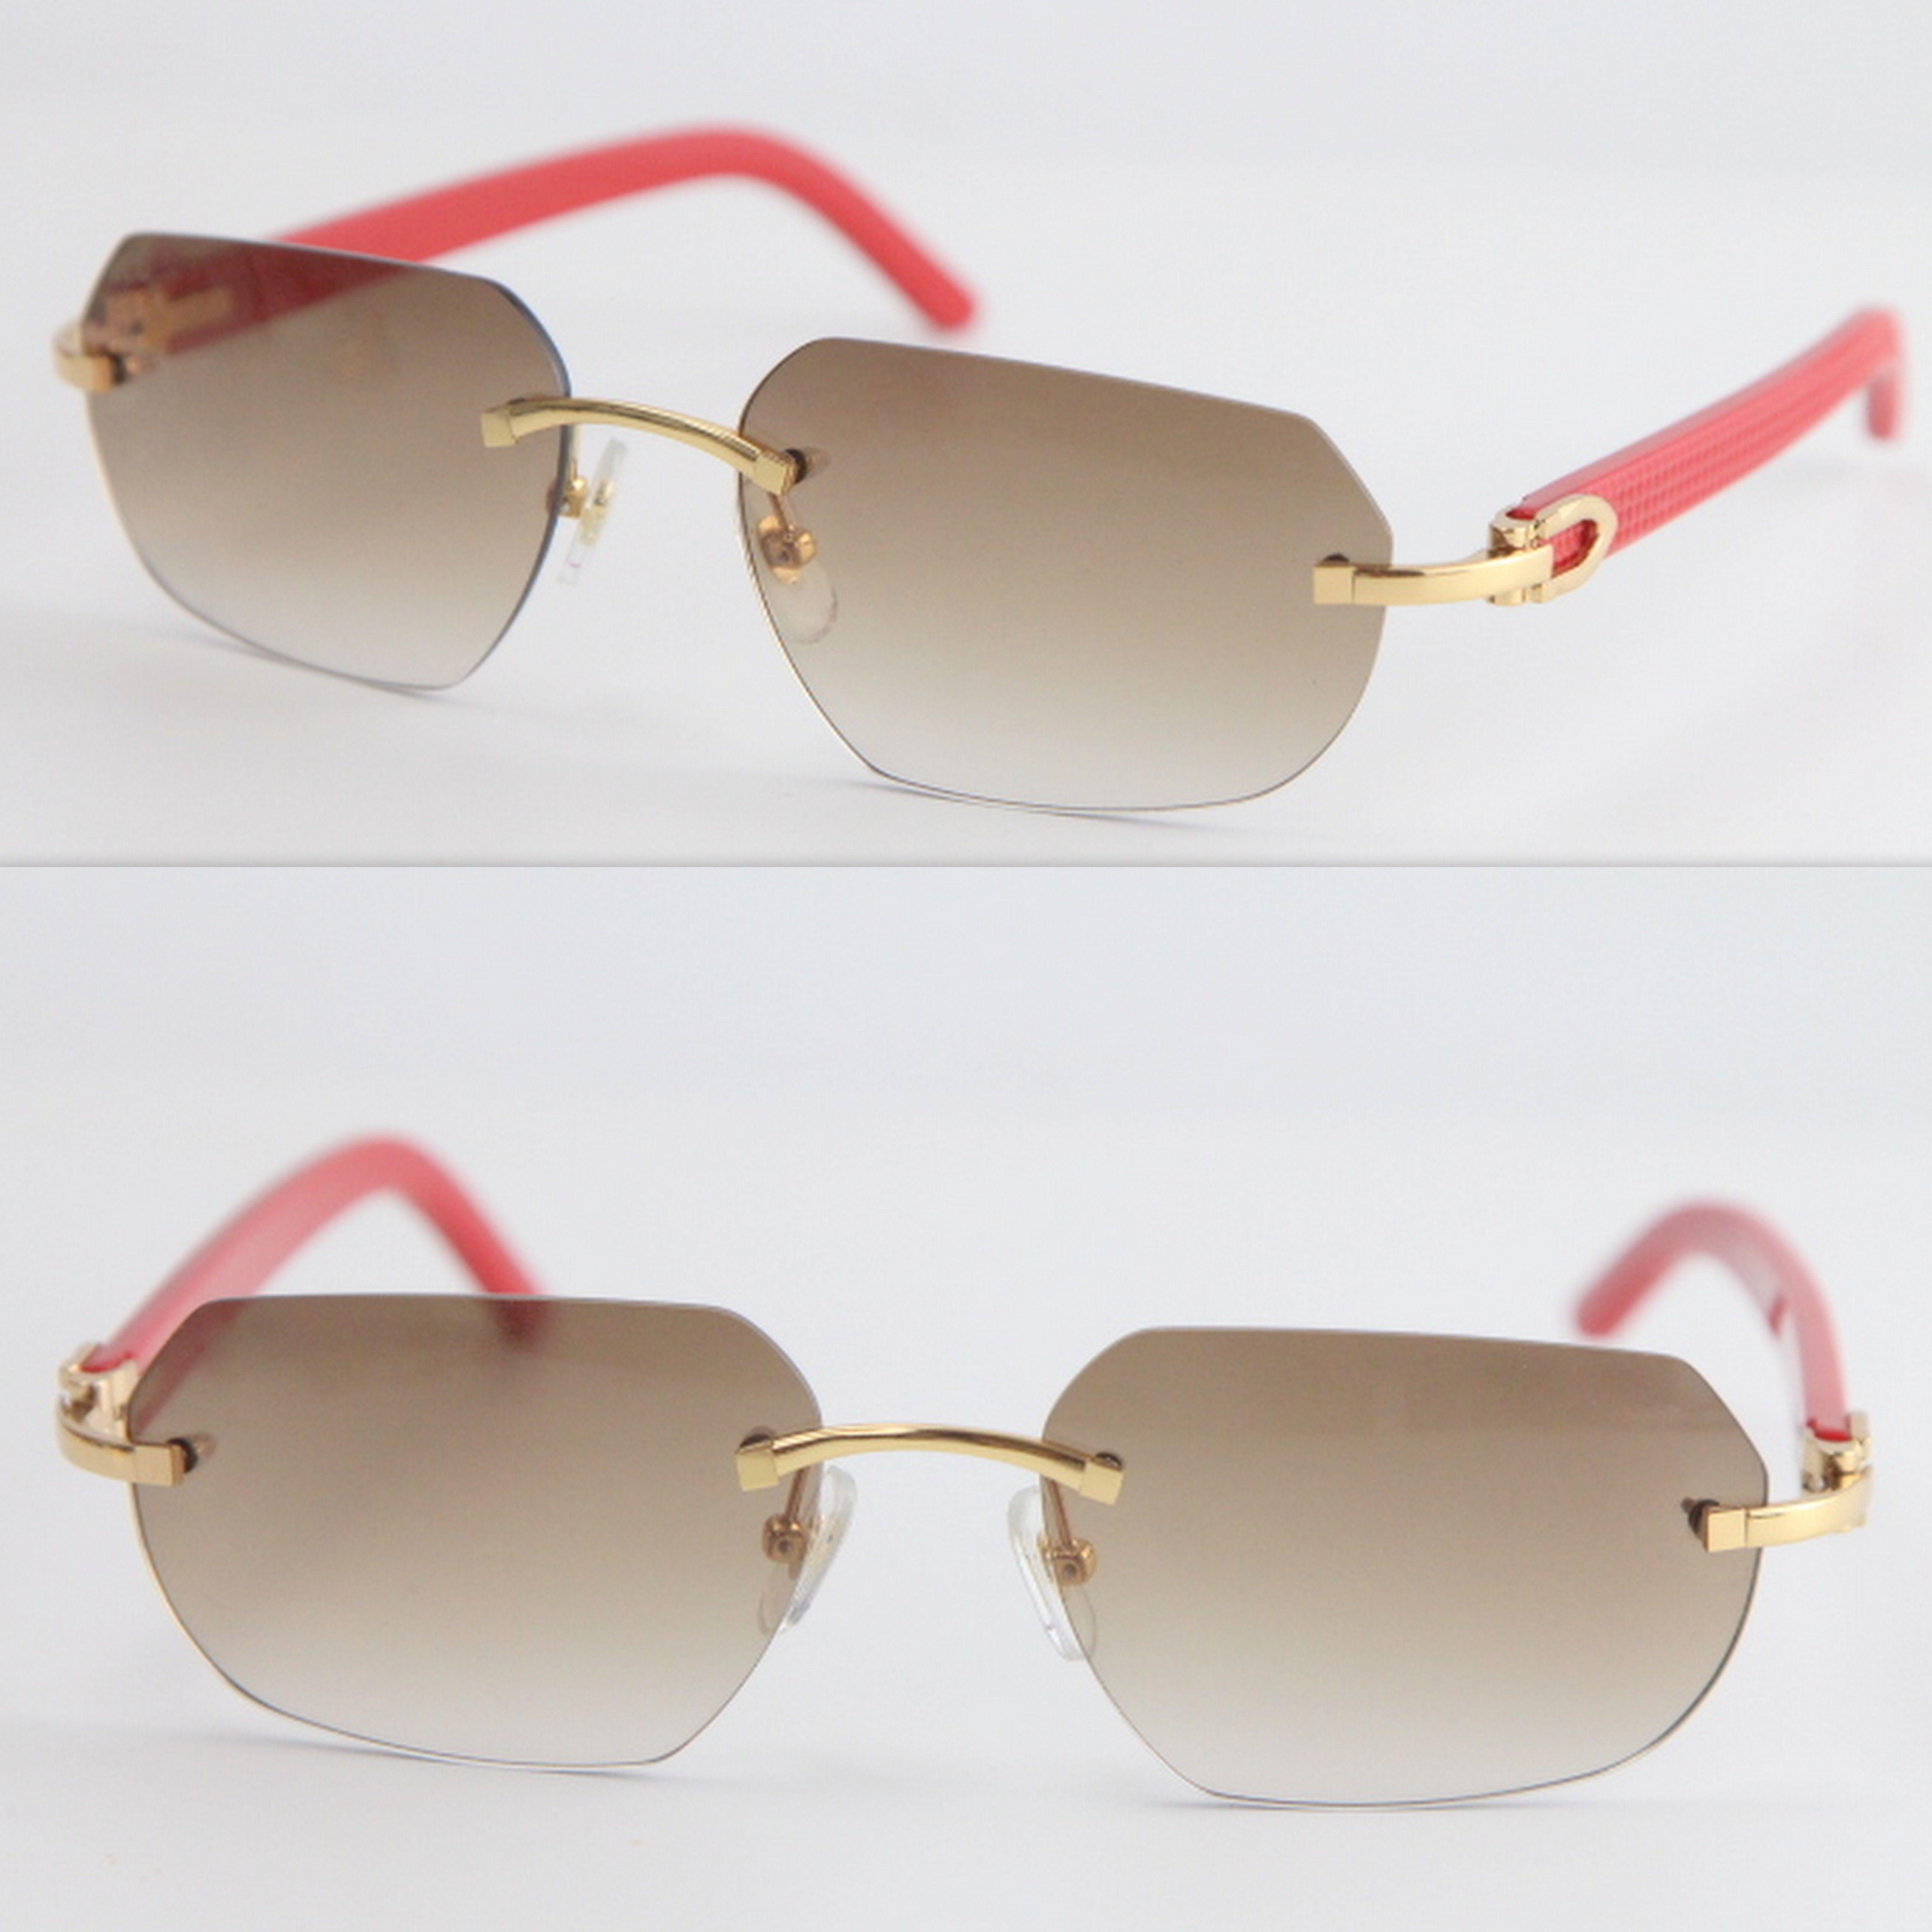 Adumbral 빈티지 디자이너 남성 여성 여성 무선 붉은 판자 선글라스 Unisex 도매 안경 운전 스포츠 고양이 눈 안경 망 사각형